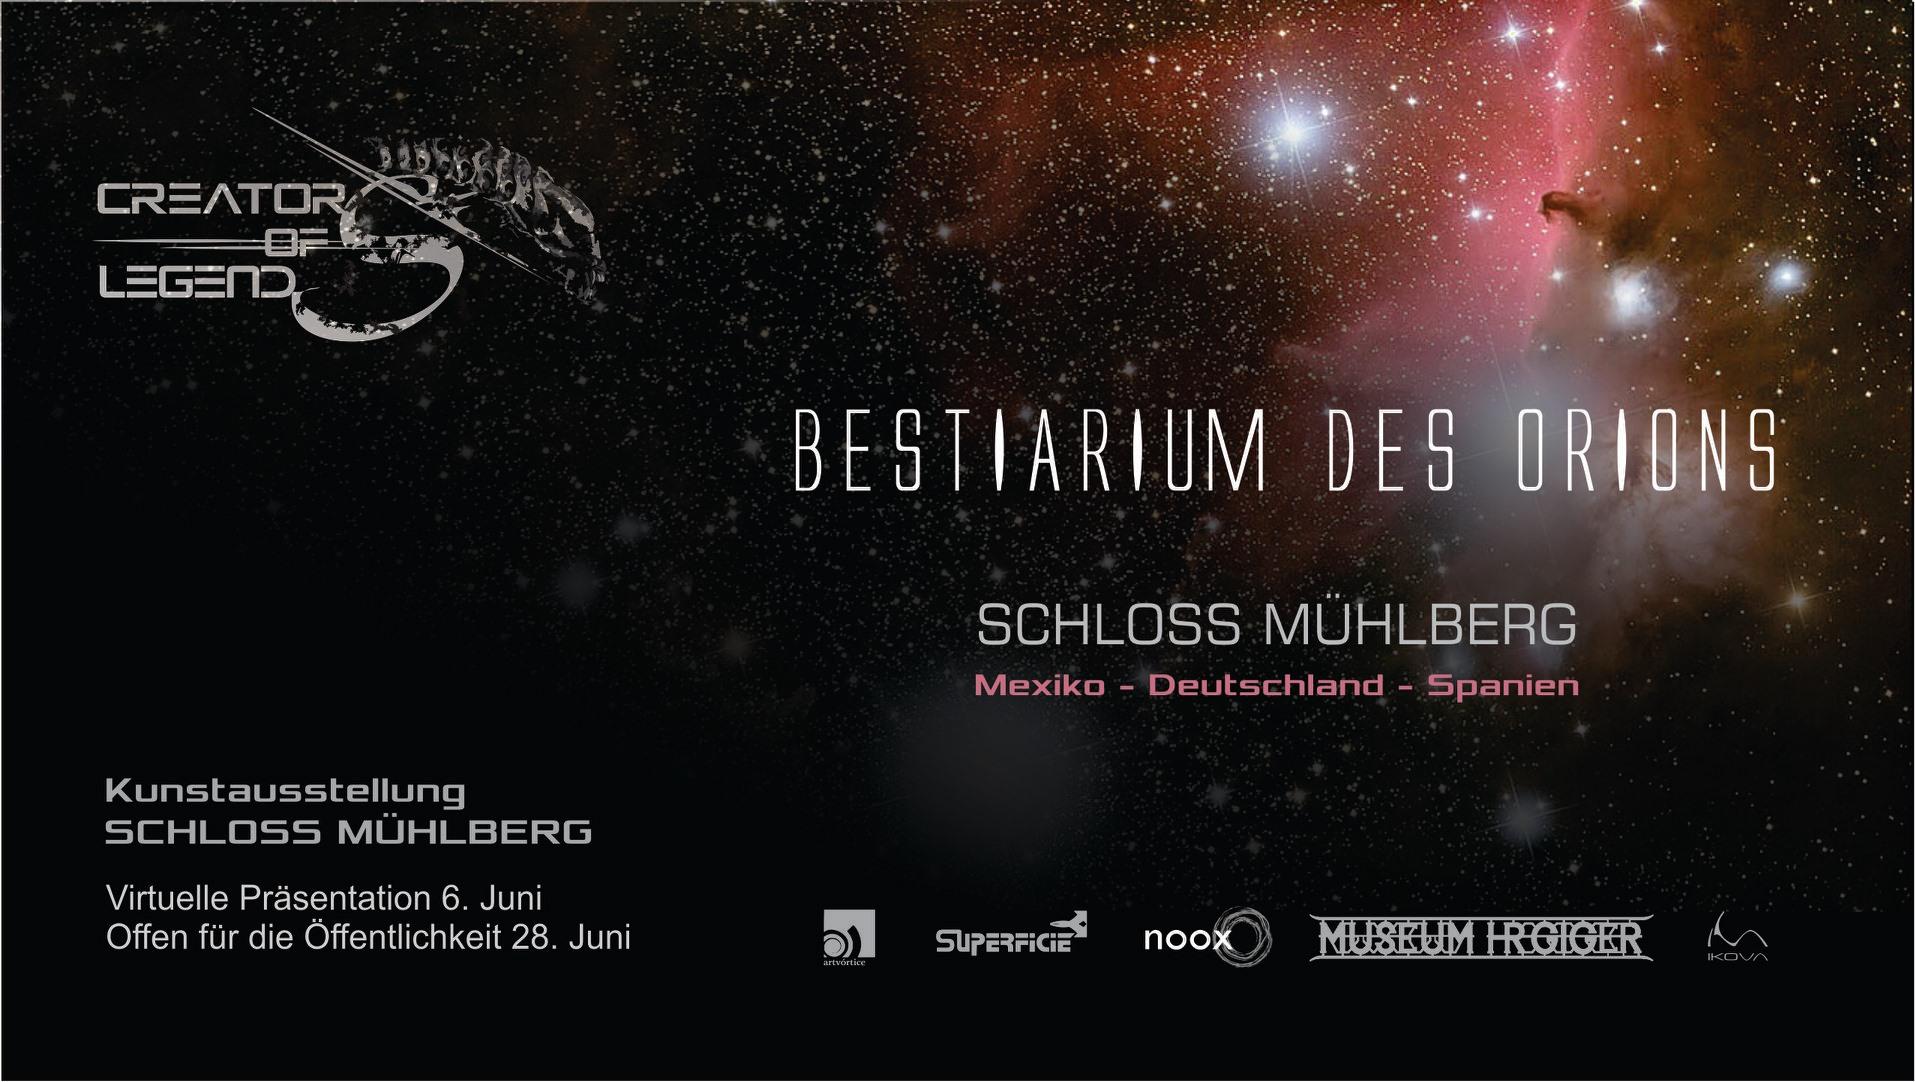 Bestiario de Orion Mühlberg .jpg